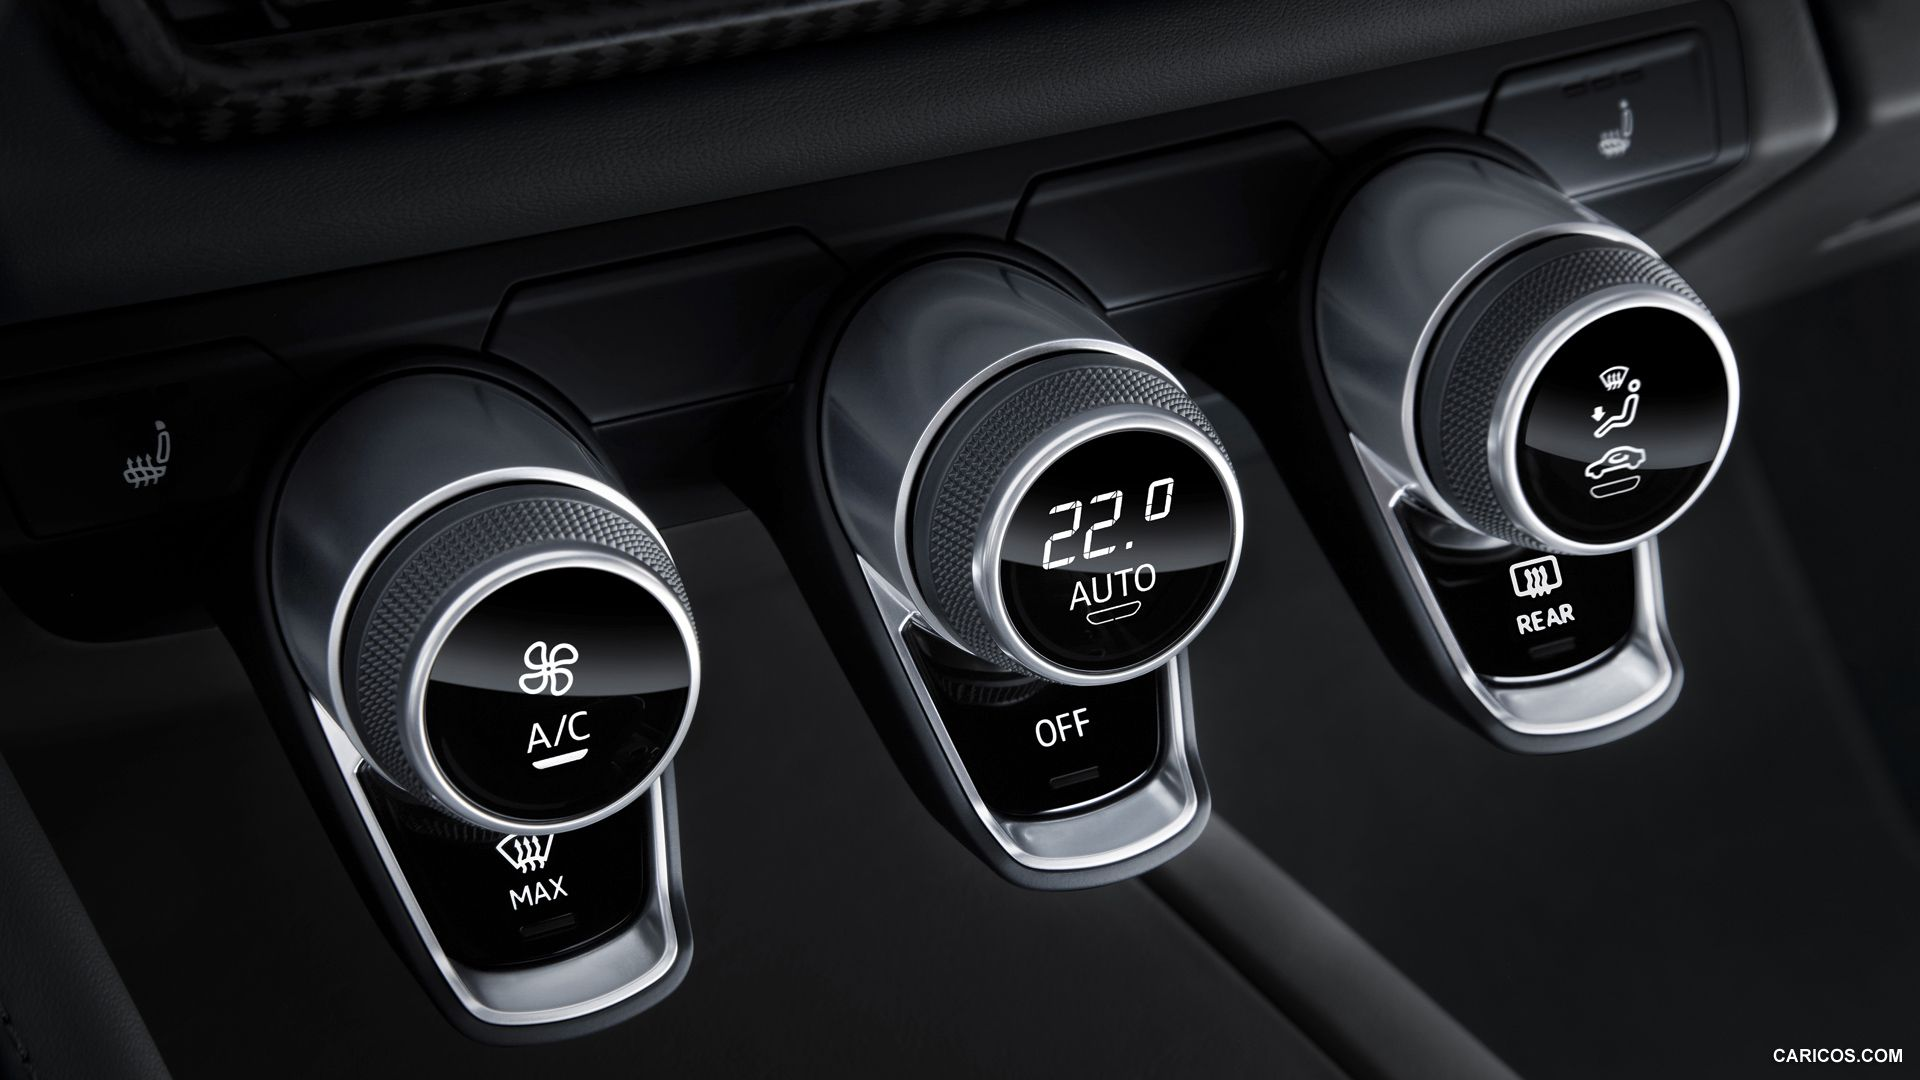 2016 Audi R8 V10 Plus Interior Detail HD audi r8